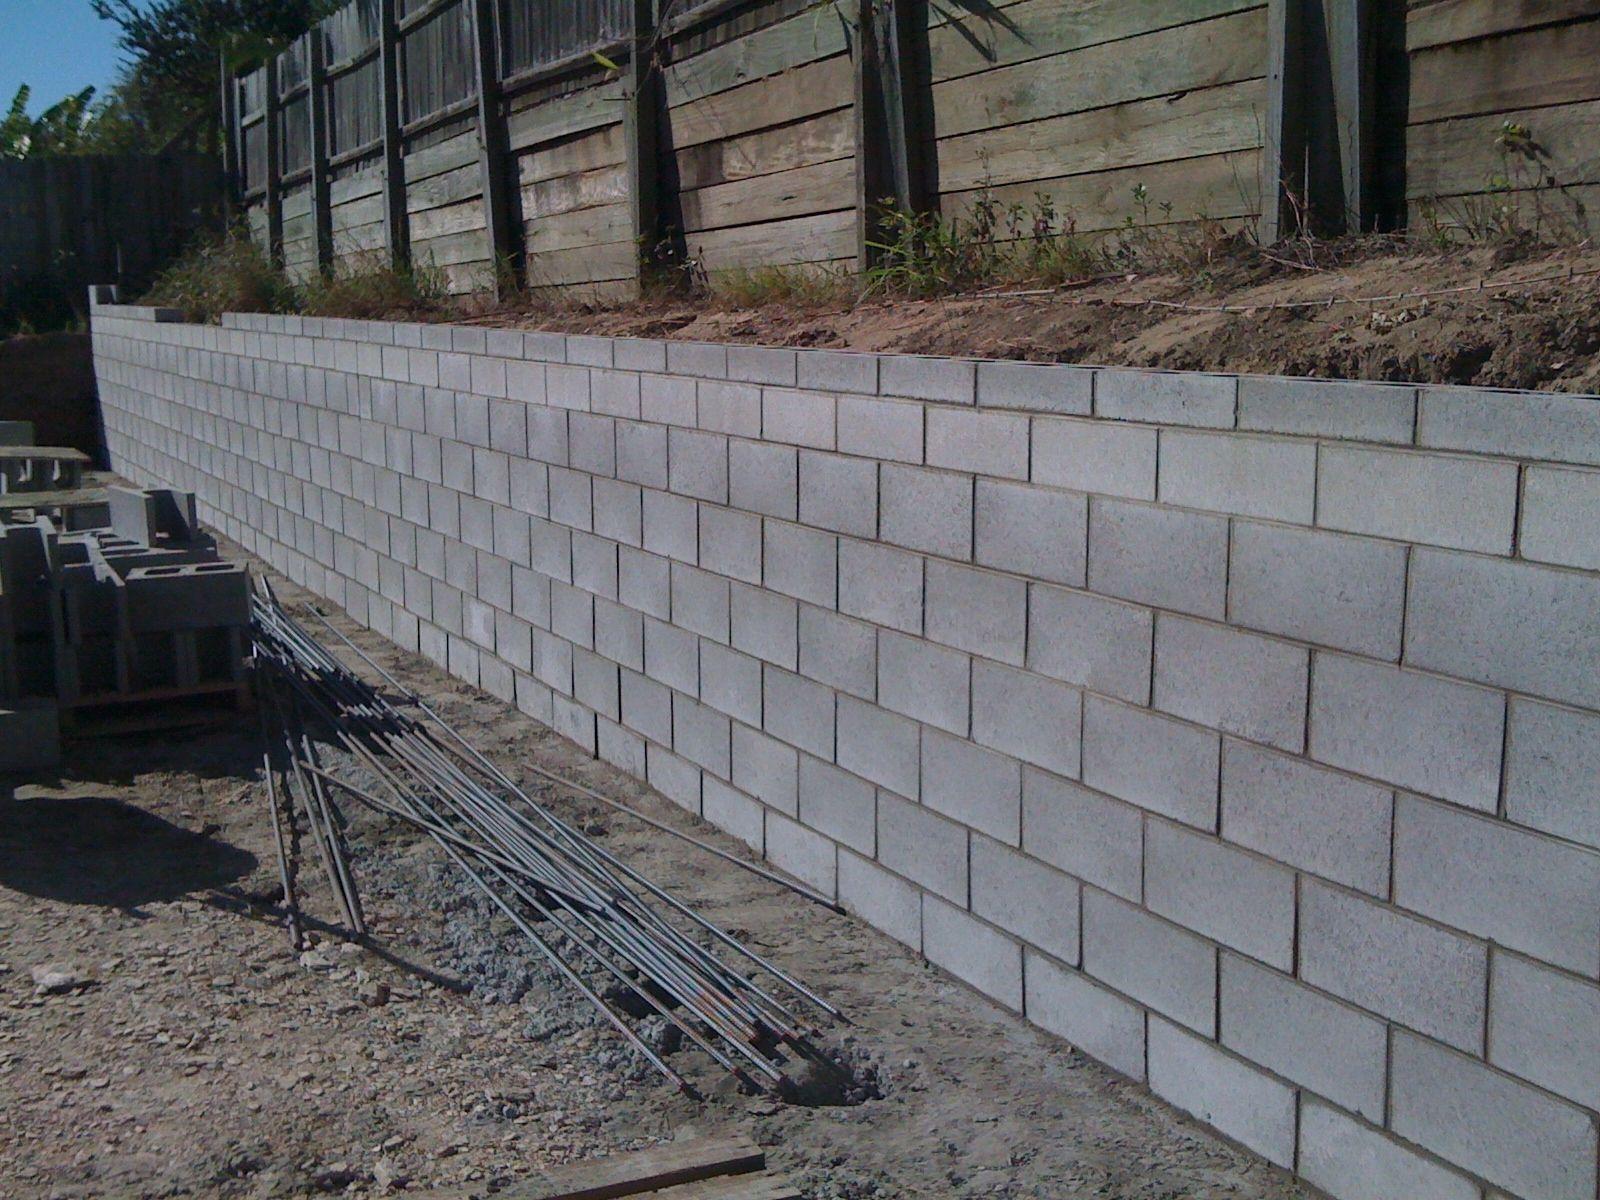 Hollow Concrete Block Retaining Wall Design In 2020 Concrete Block Retaining Wall Cheap Retaining Wall Retaining Wall Design